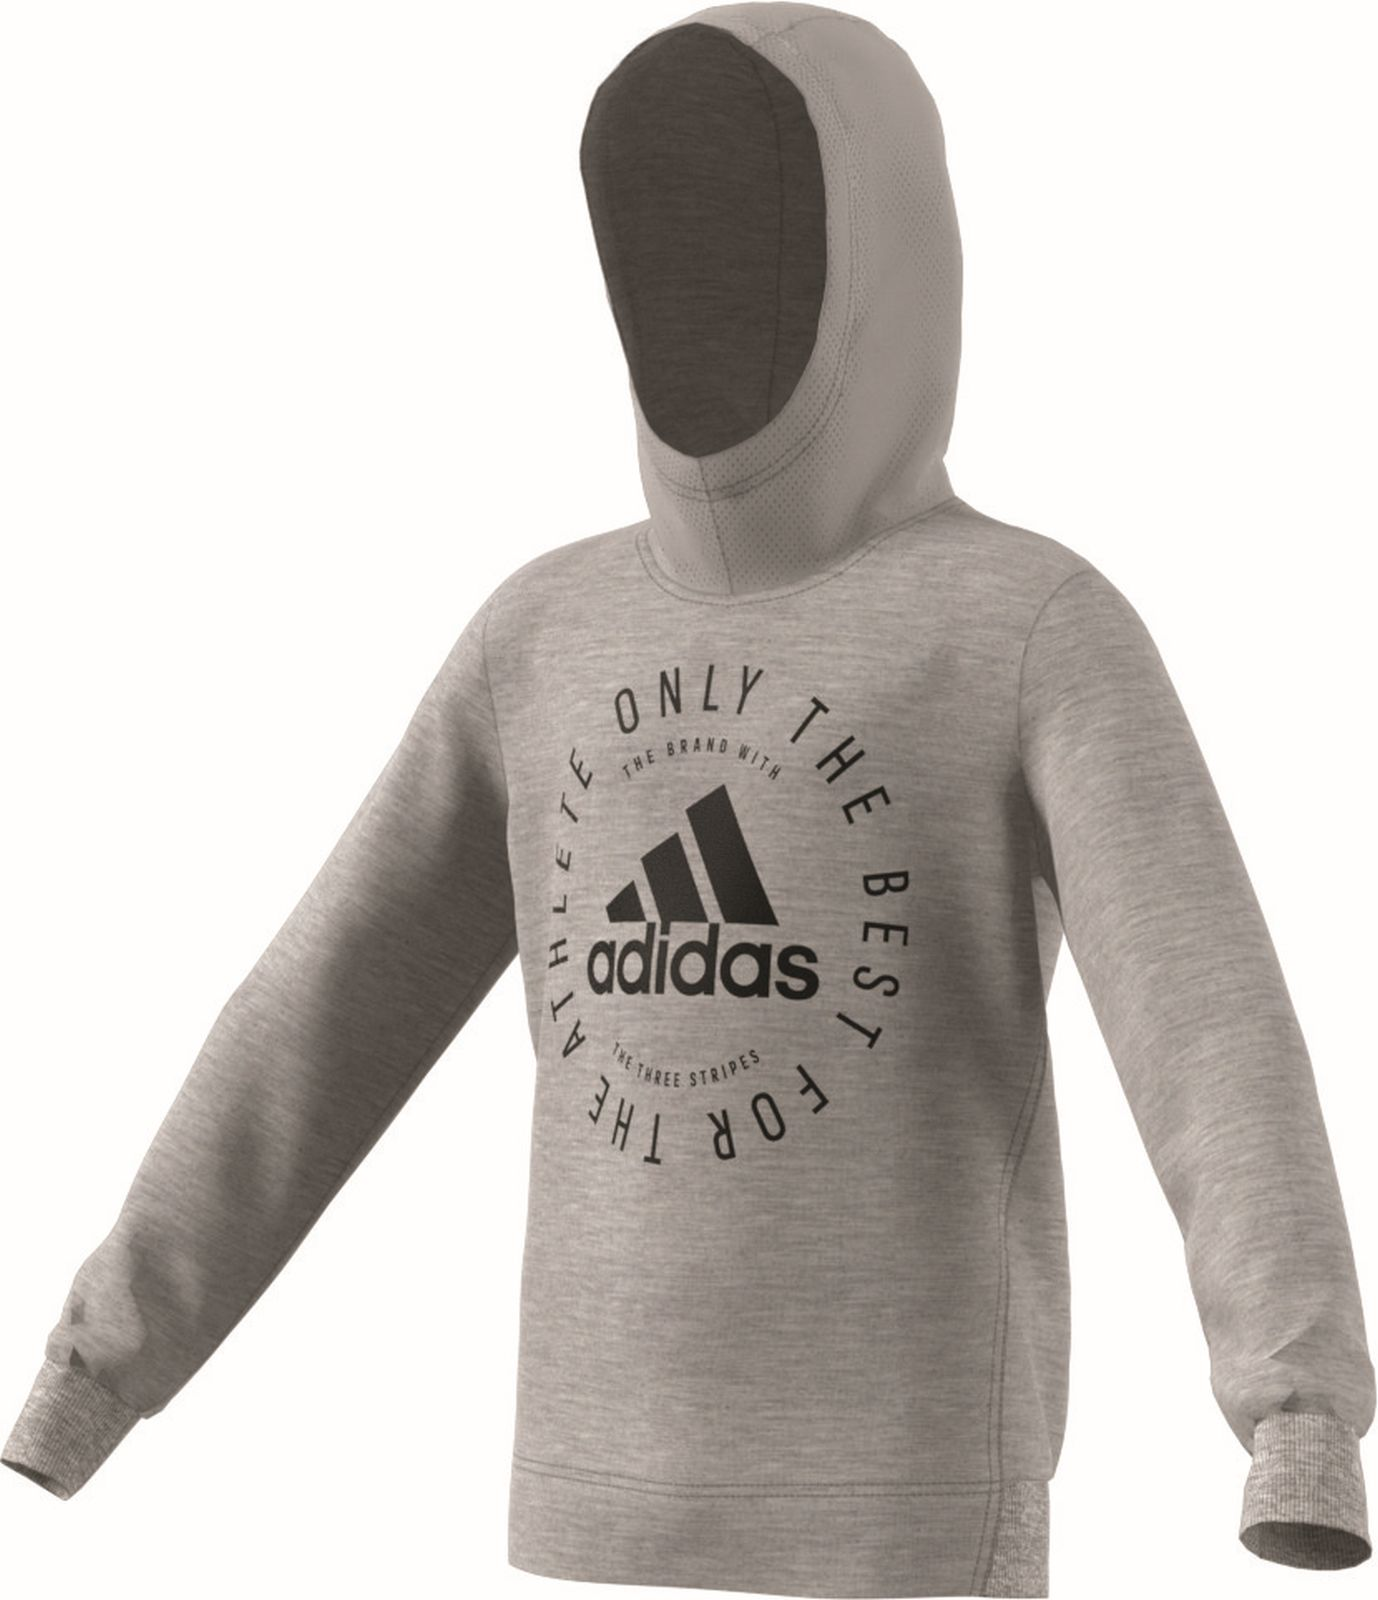 Details zu adidas Performance Kinder Kapuzenjacke Sport ID Hoodie grau